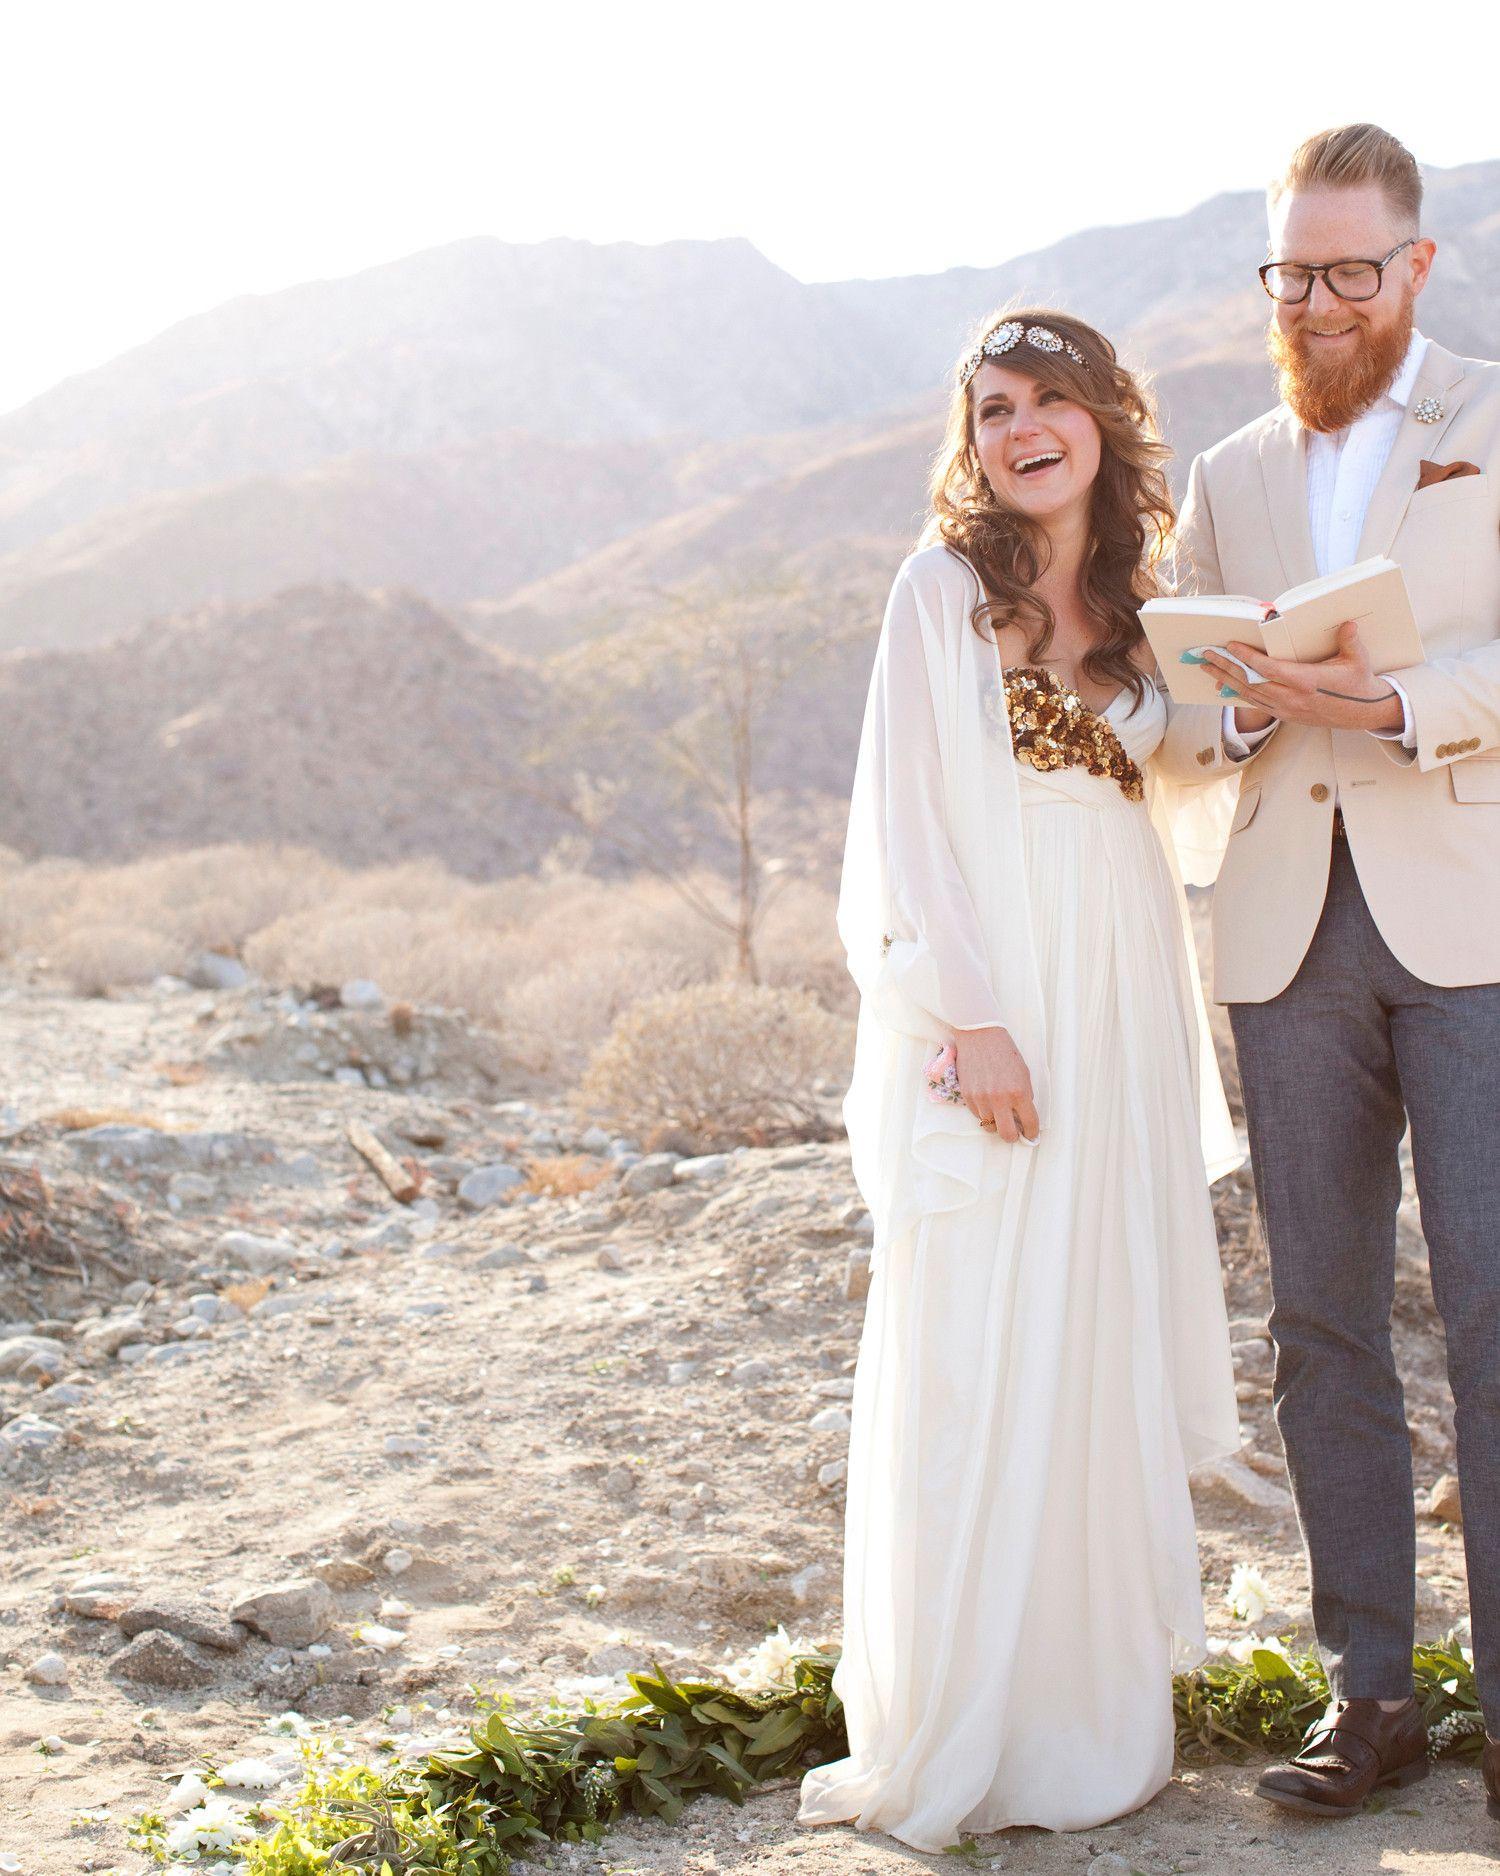 fun wedding ceremony script ideas